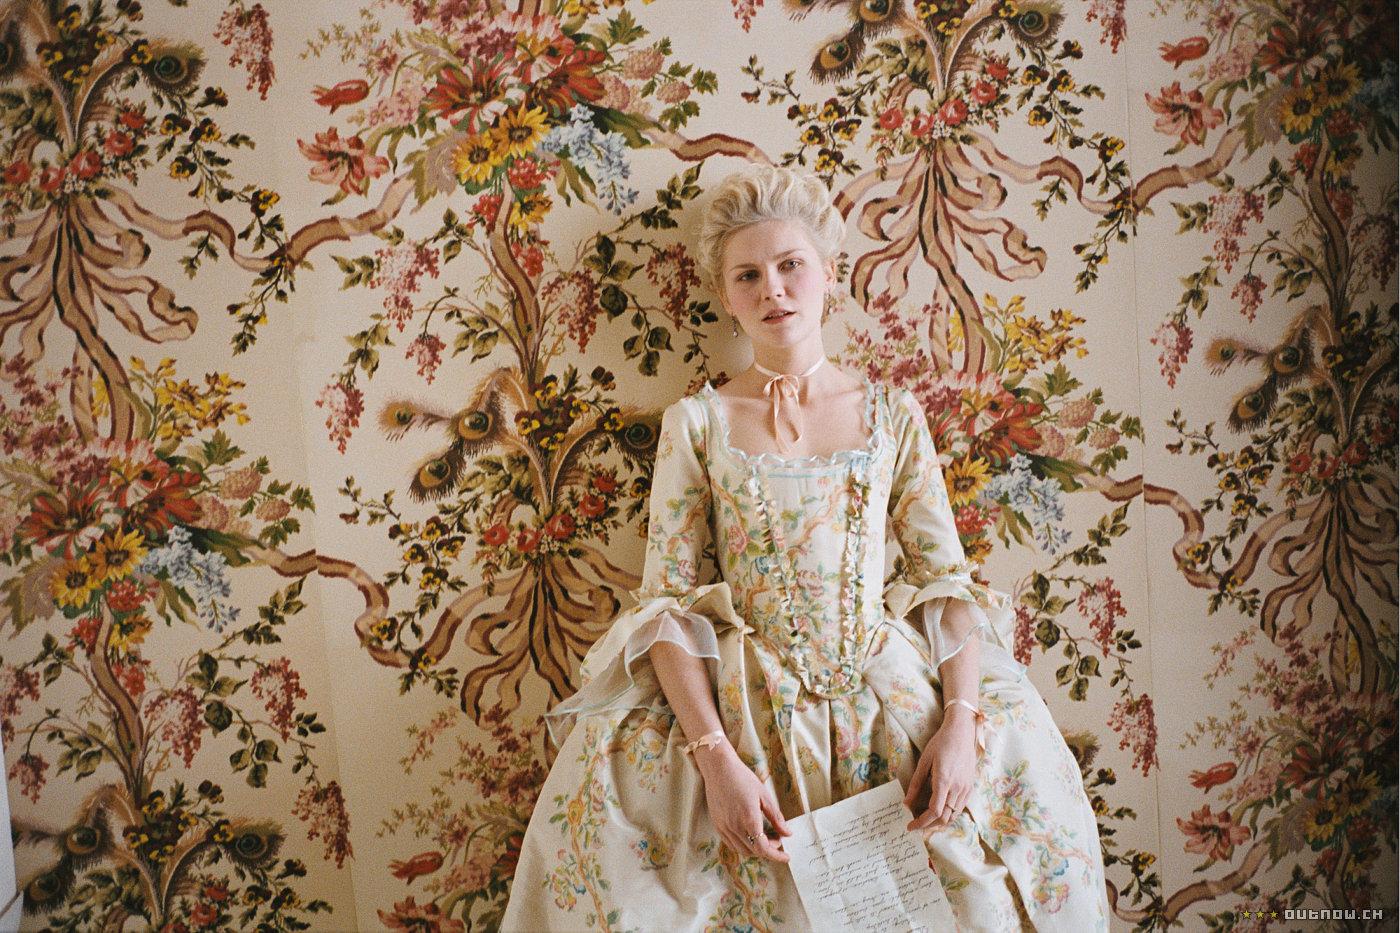 http://1.bp.blogspot.com/-I964f7NcaoM/T9GWk8y8MCI/AAAAAAAAAbM/-aFKqPG74-Q/s1600/marie_antoinette_screen2_large.jpg